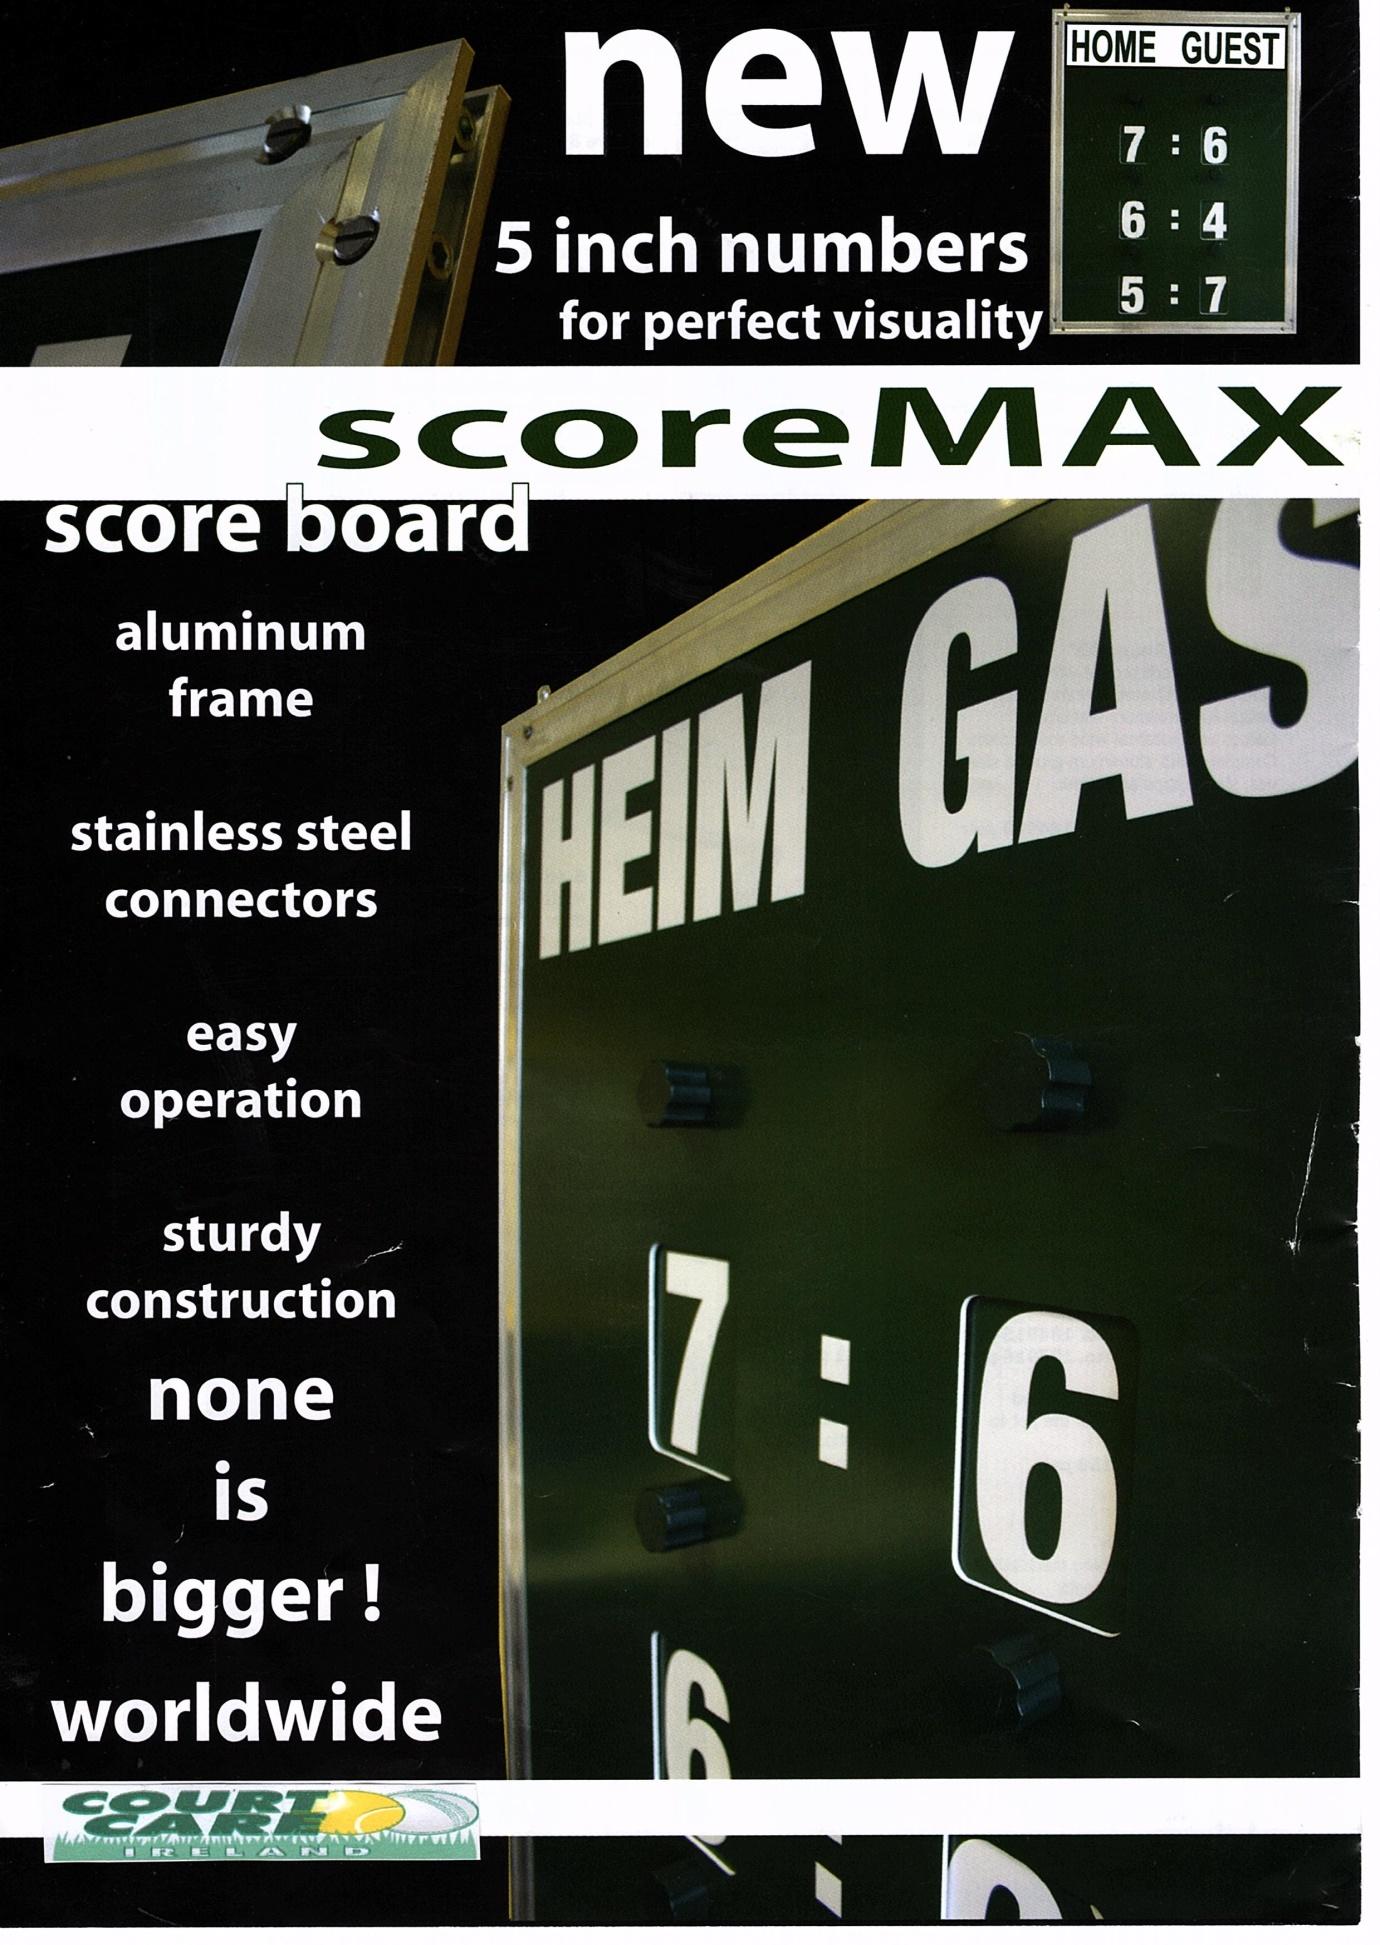 Scoremax overview